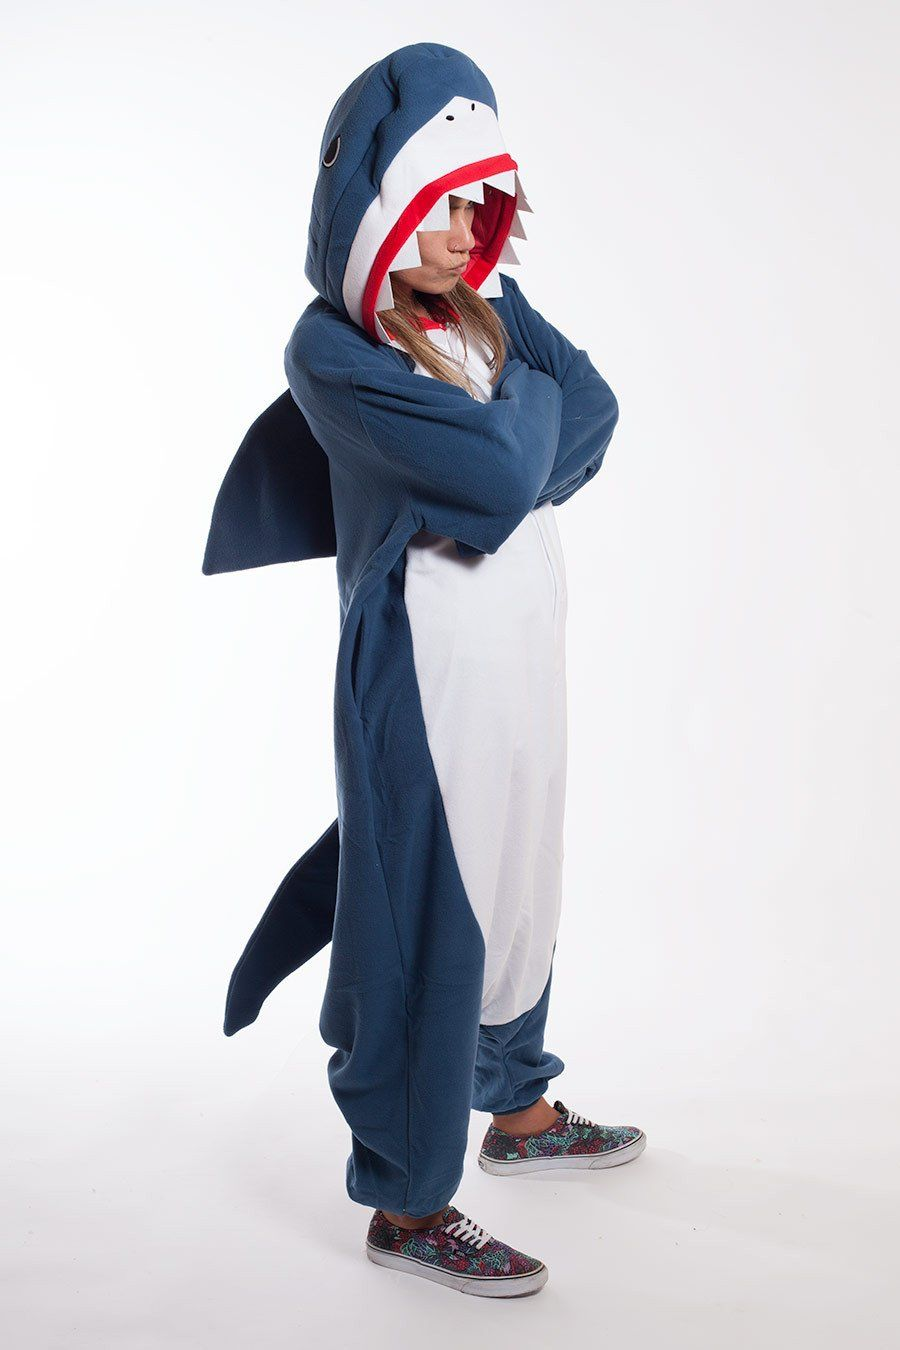 0a82f7cde6 Shark Kigurumi Onesie Adult Costume Pajamas Front Más